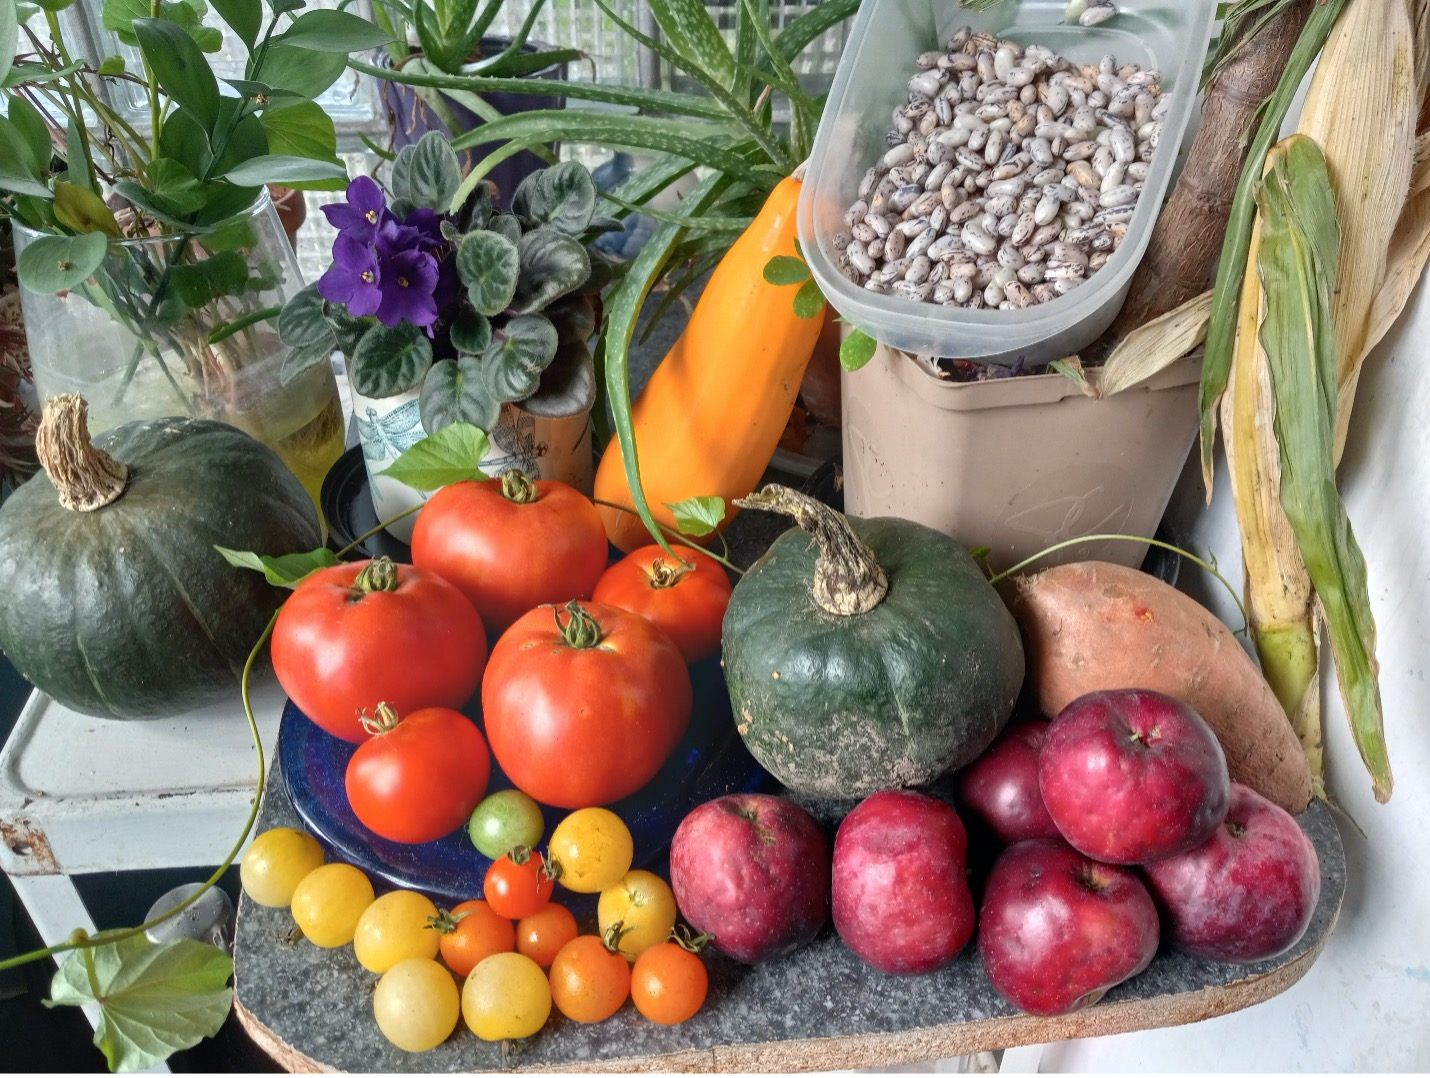 Autumn Harvest -  Photo by Linda Tu